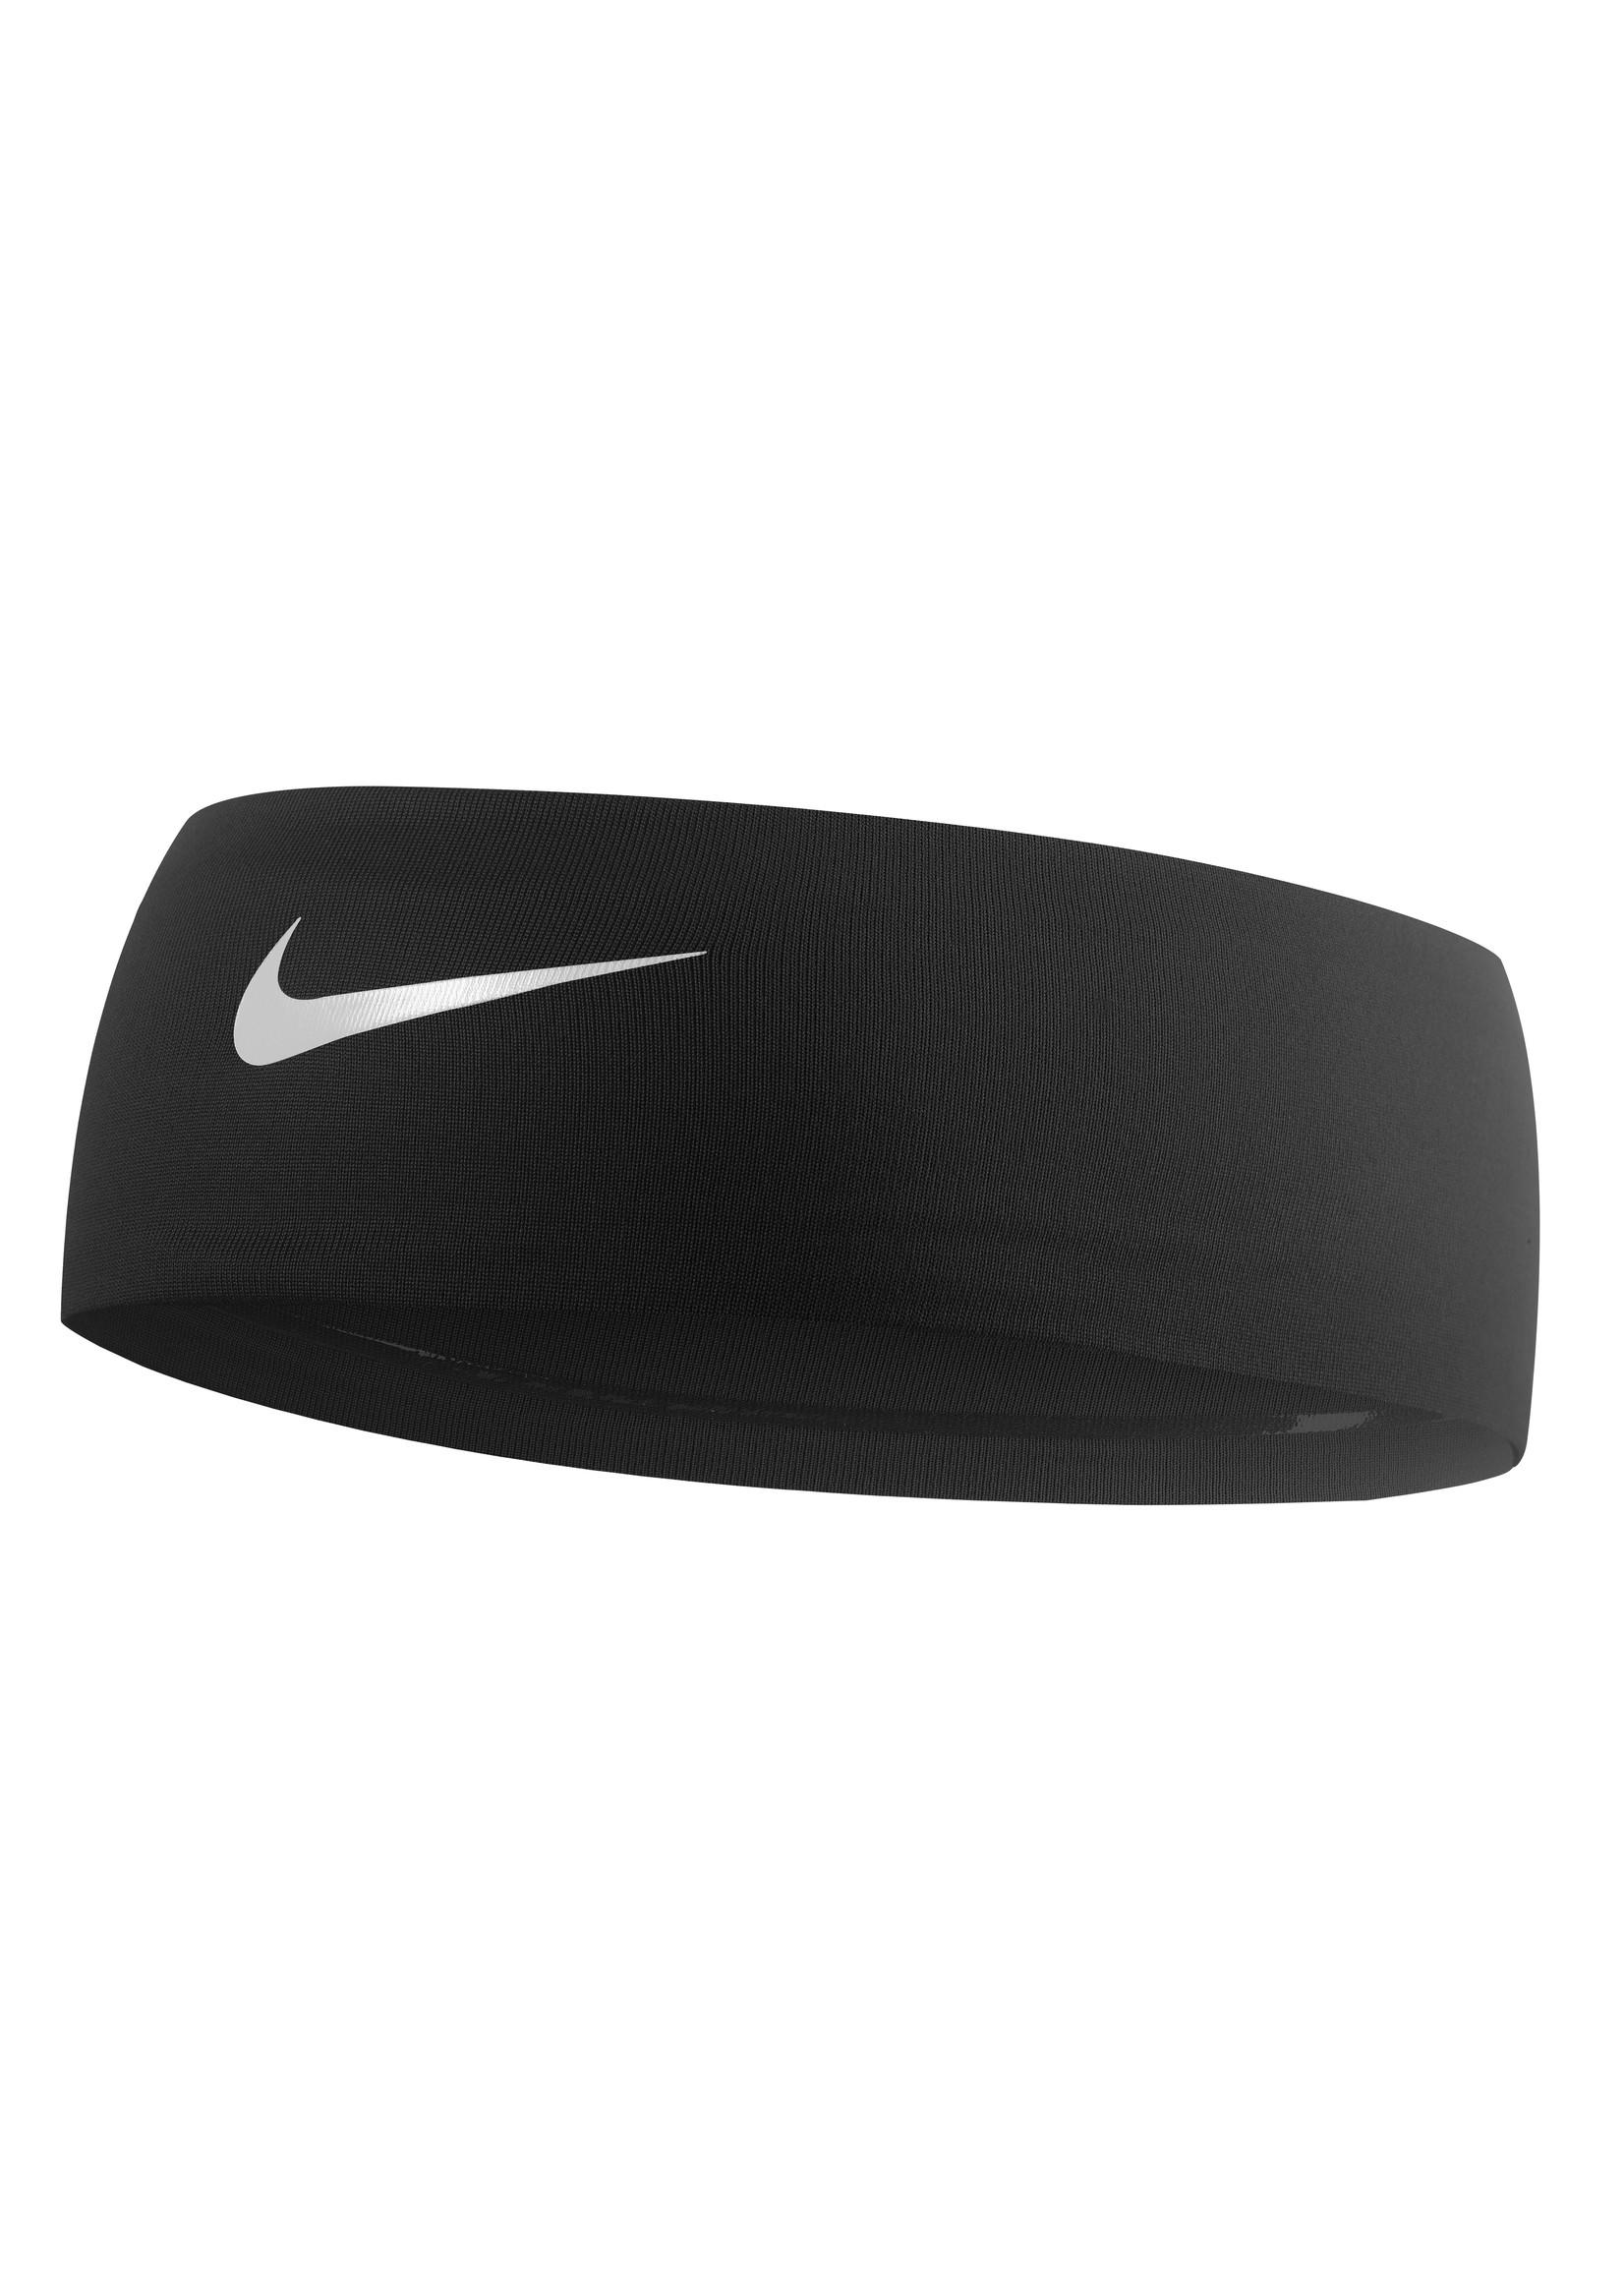 Nike Fury Headband 2.0 Youth Black/White